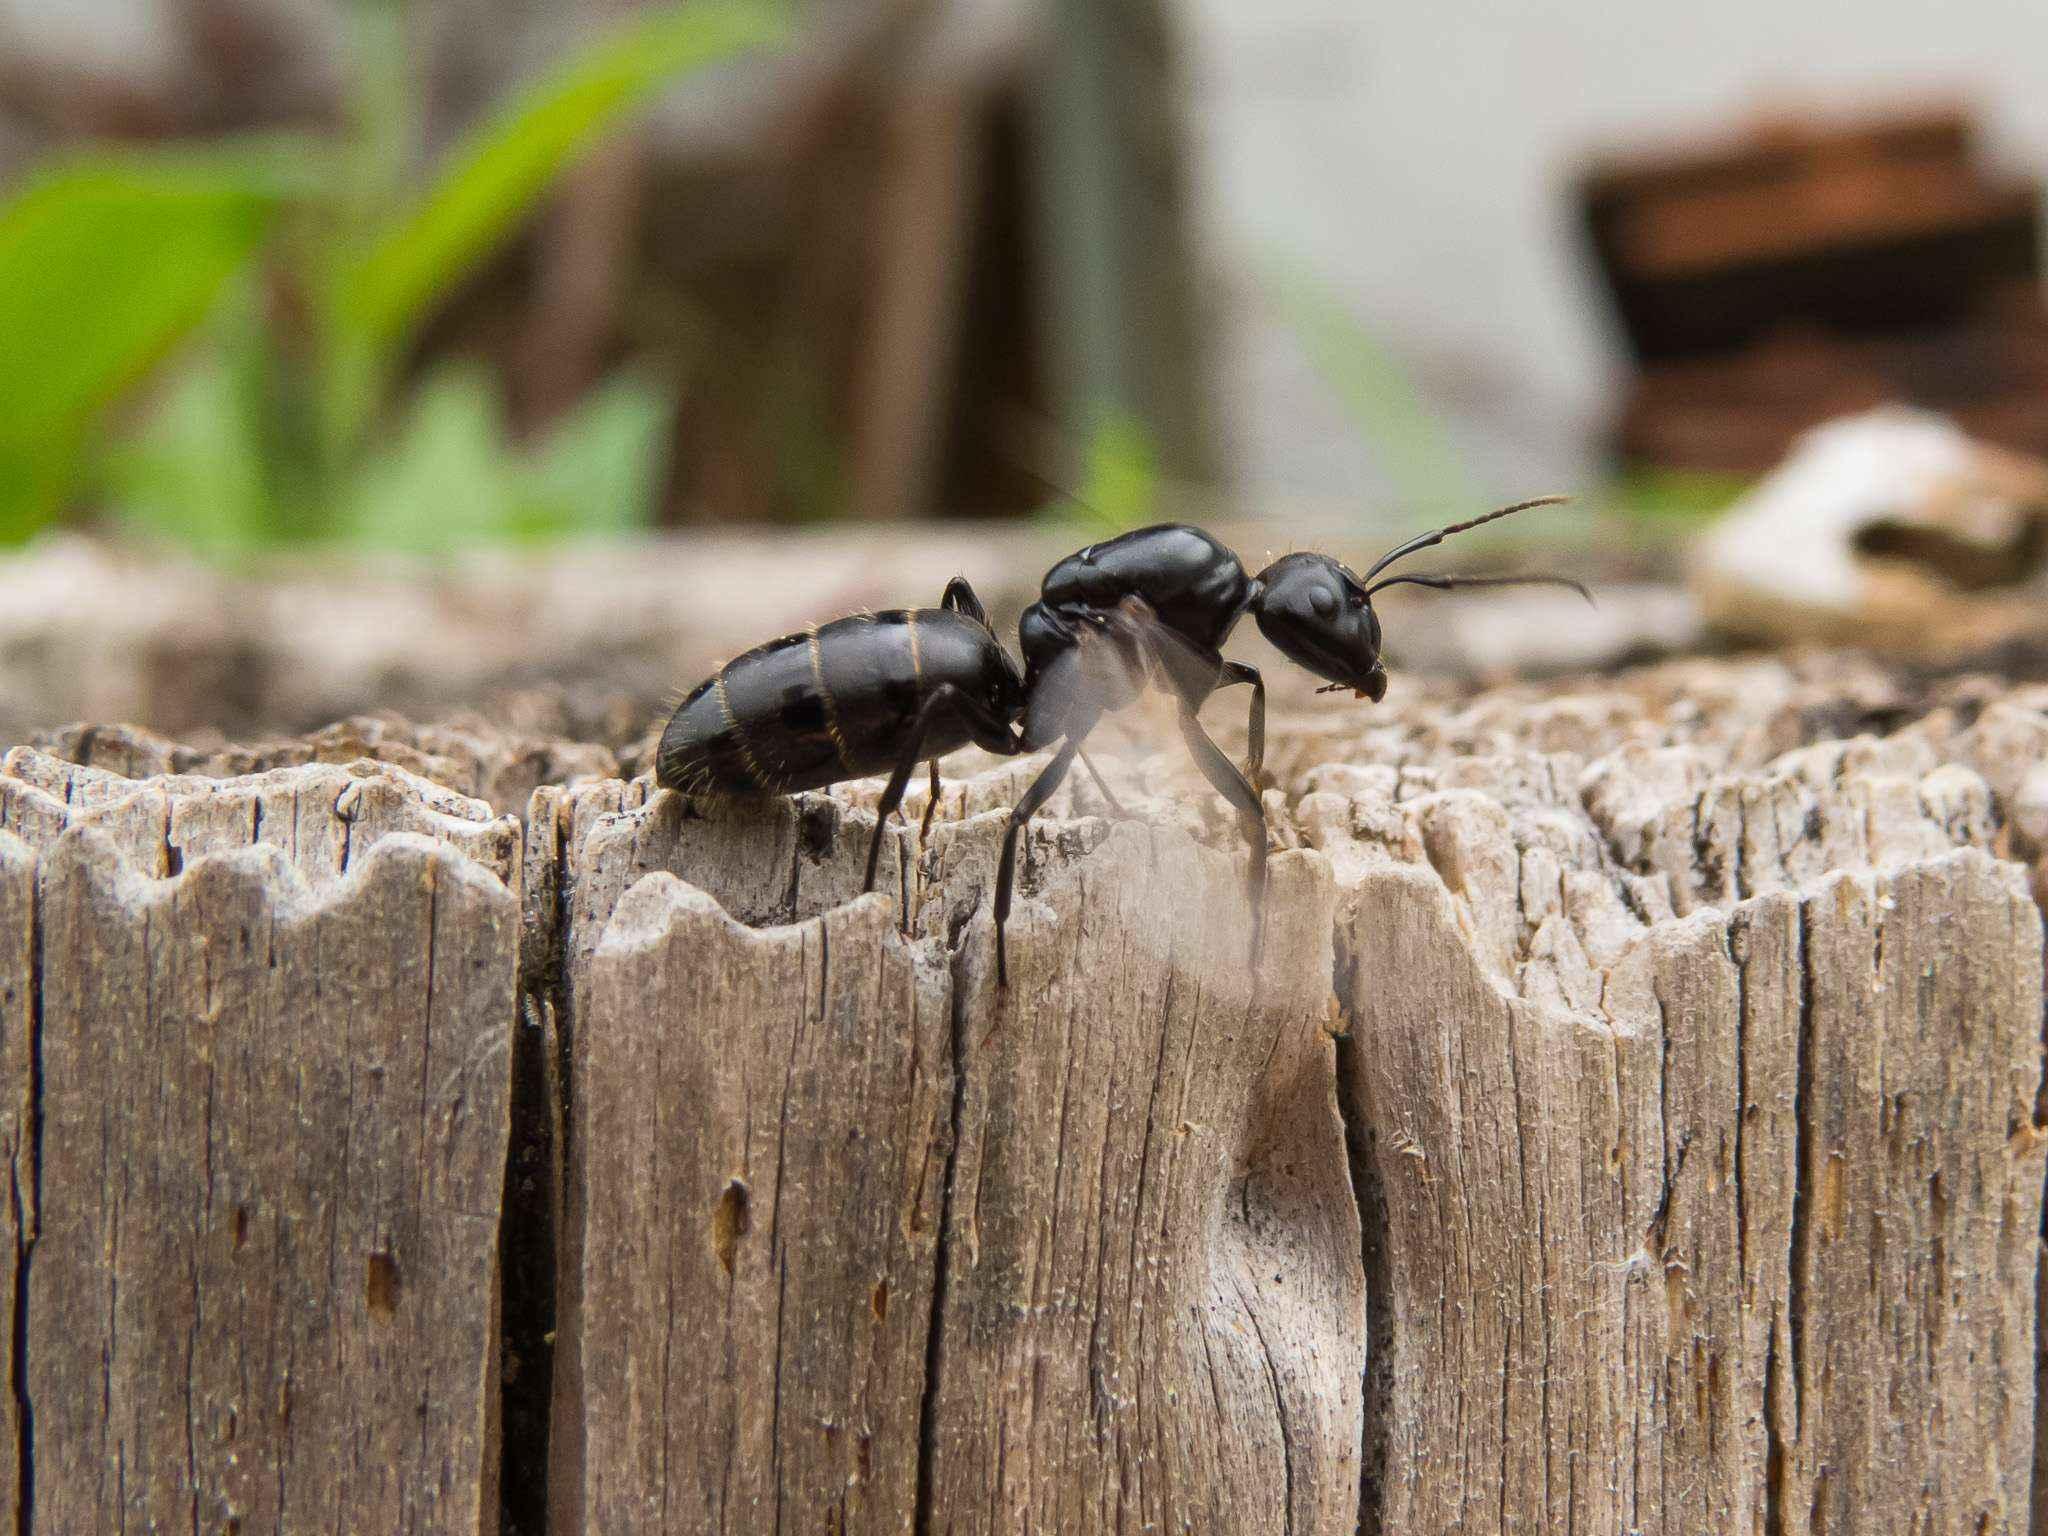 camponotus vagus aufw rmen f r den schwarmflug crazy ants. Black Bedroom Furniture Sets. Home Design Ideas